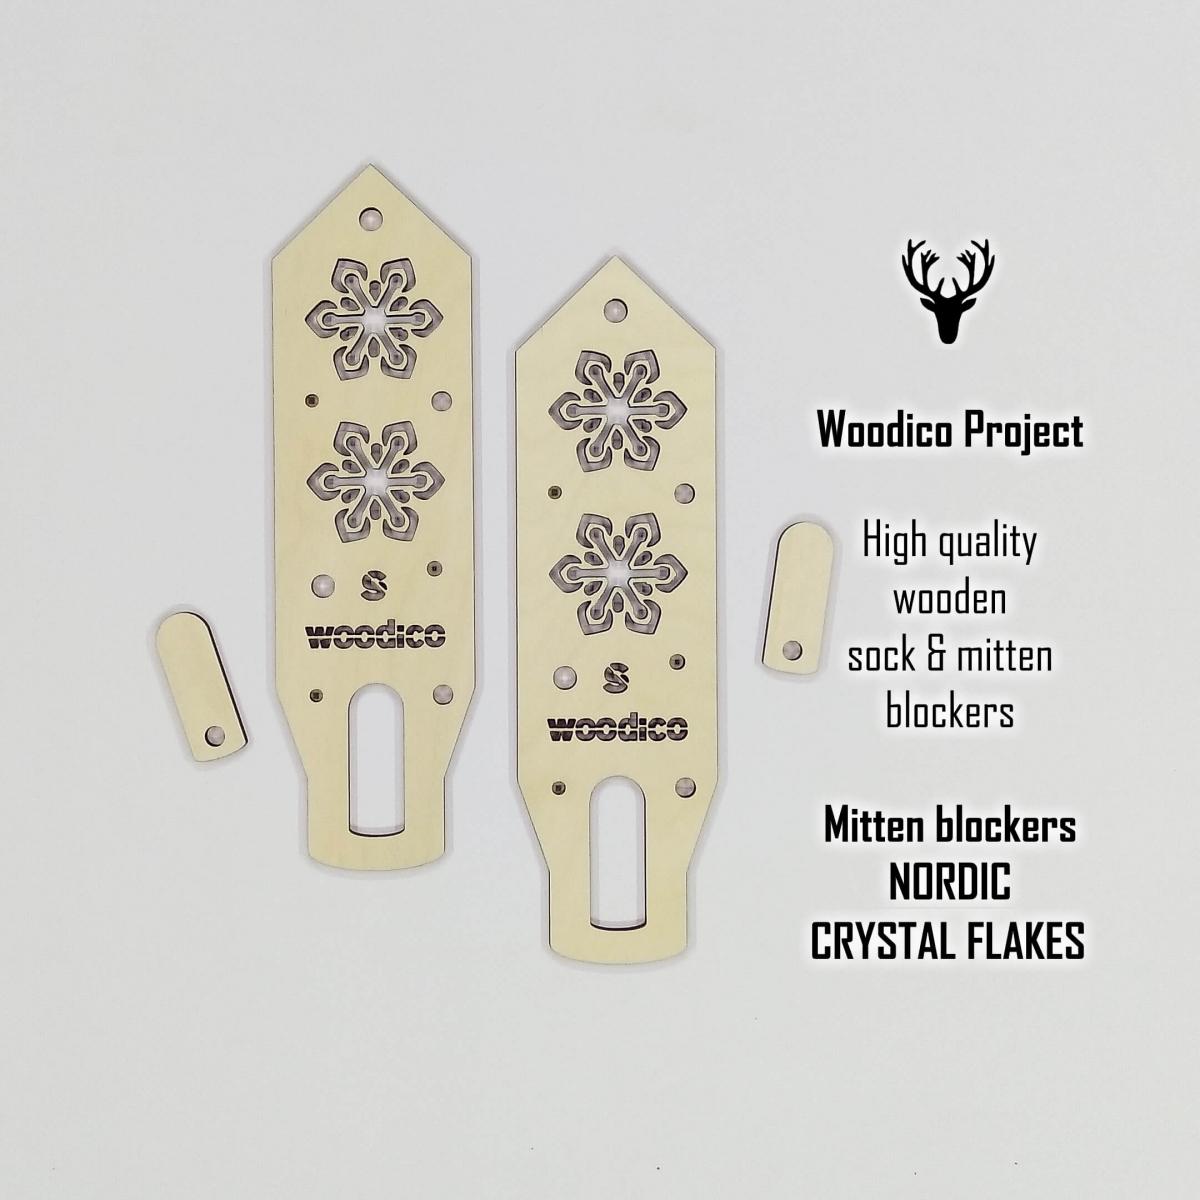 woodico.pro wooden mitten blockers crystal flakes 1200x1200 - Wooden mitten blockers / Nordic Crystal Flakes